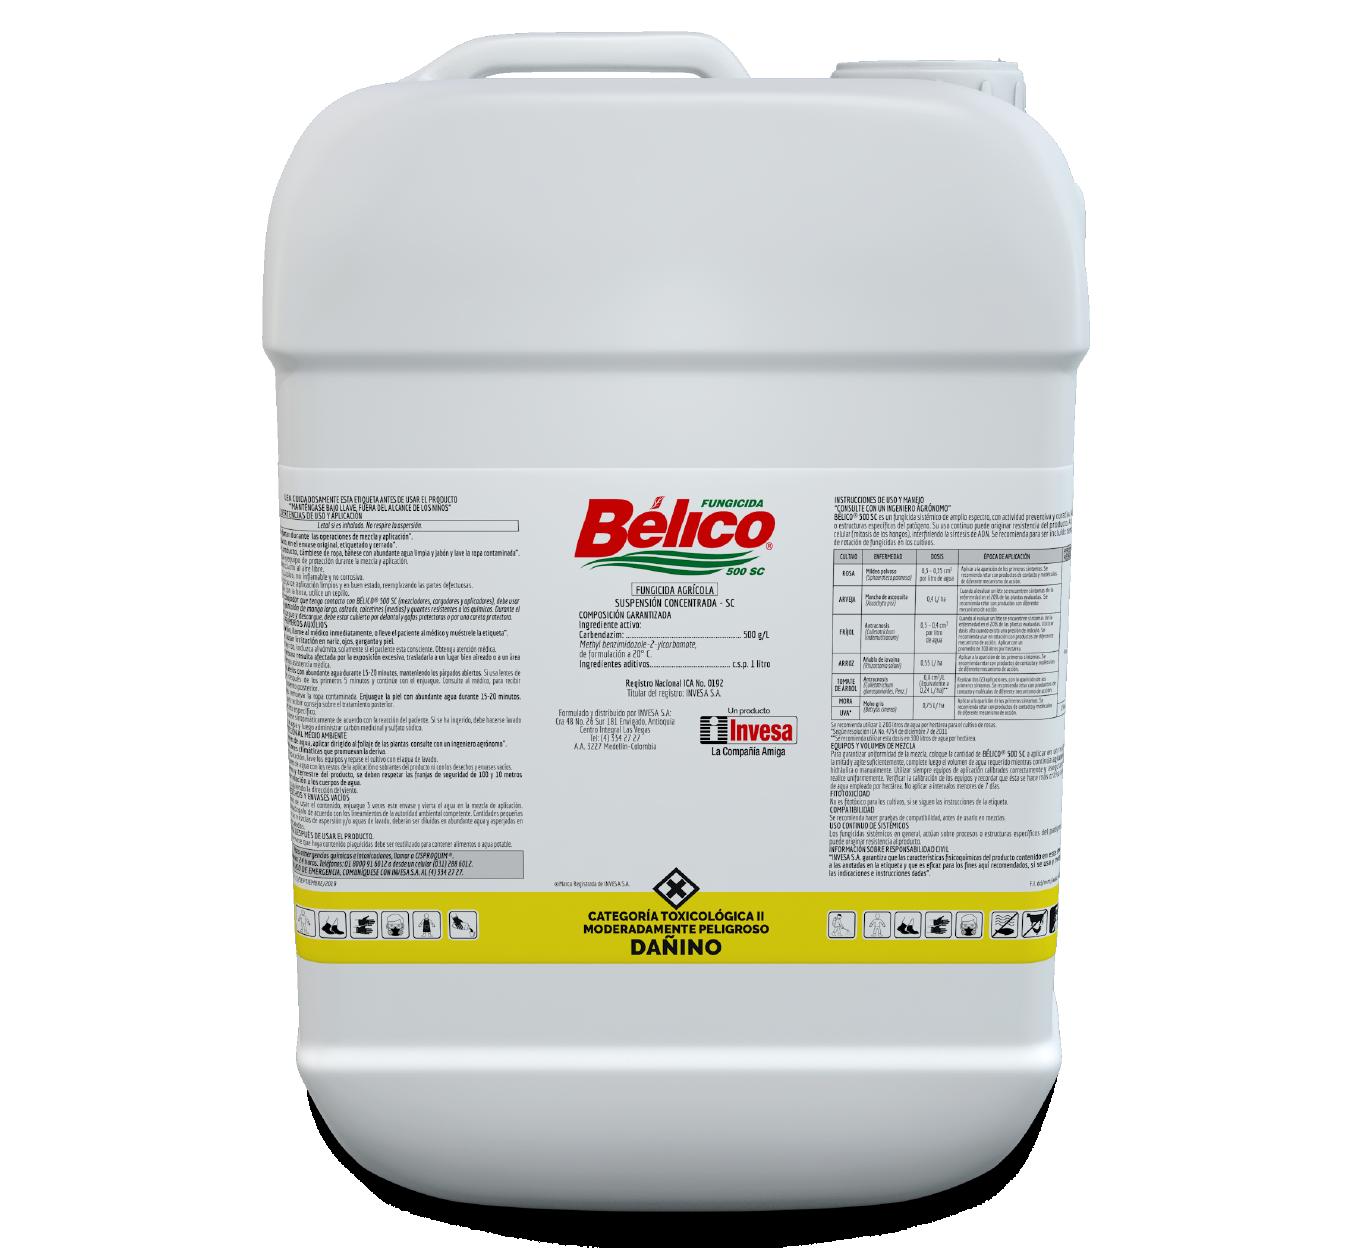 Fungicida belico 500 sc invesa 20 litros